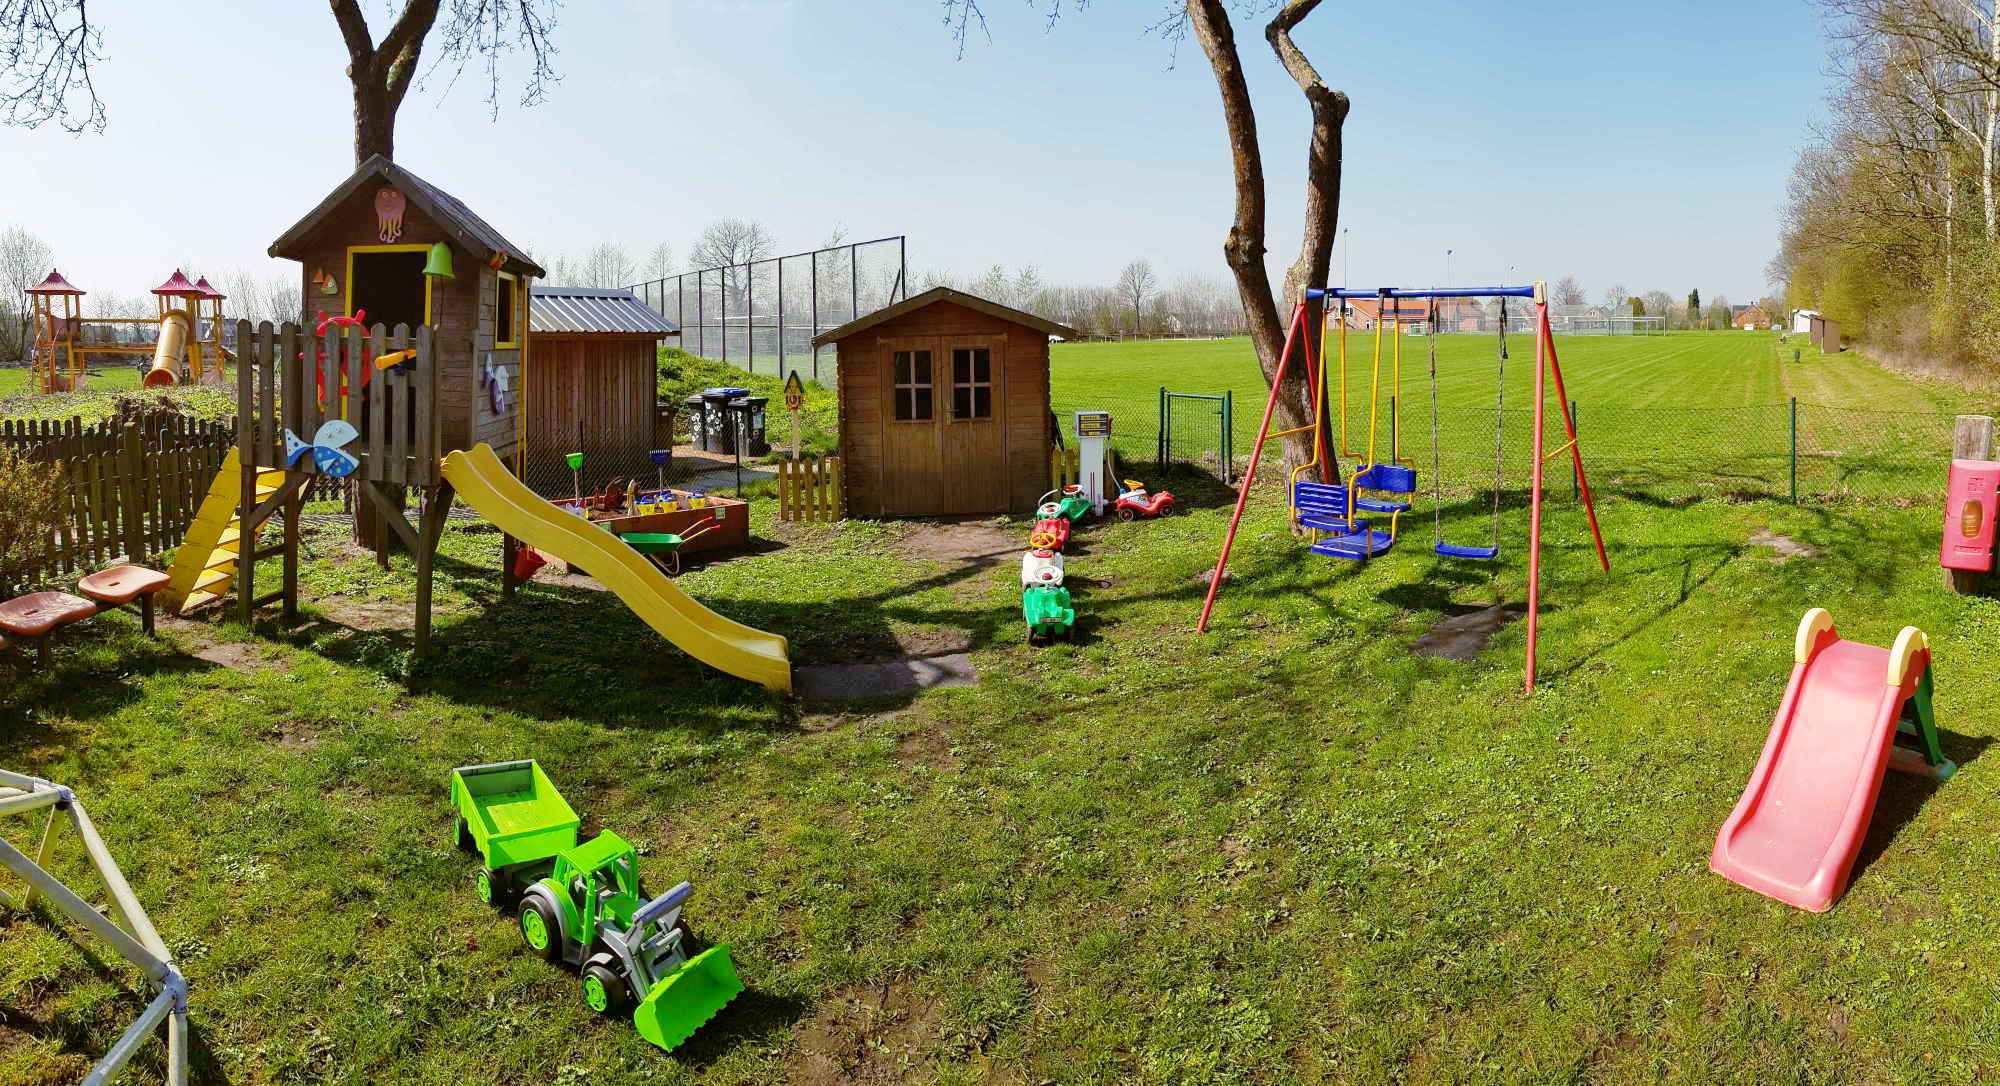 Kita Kid Zone Kinderbetreuung Garten1 9 - Kinder-Beachclub